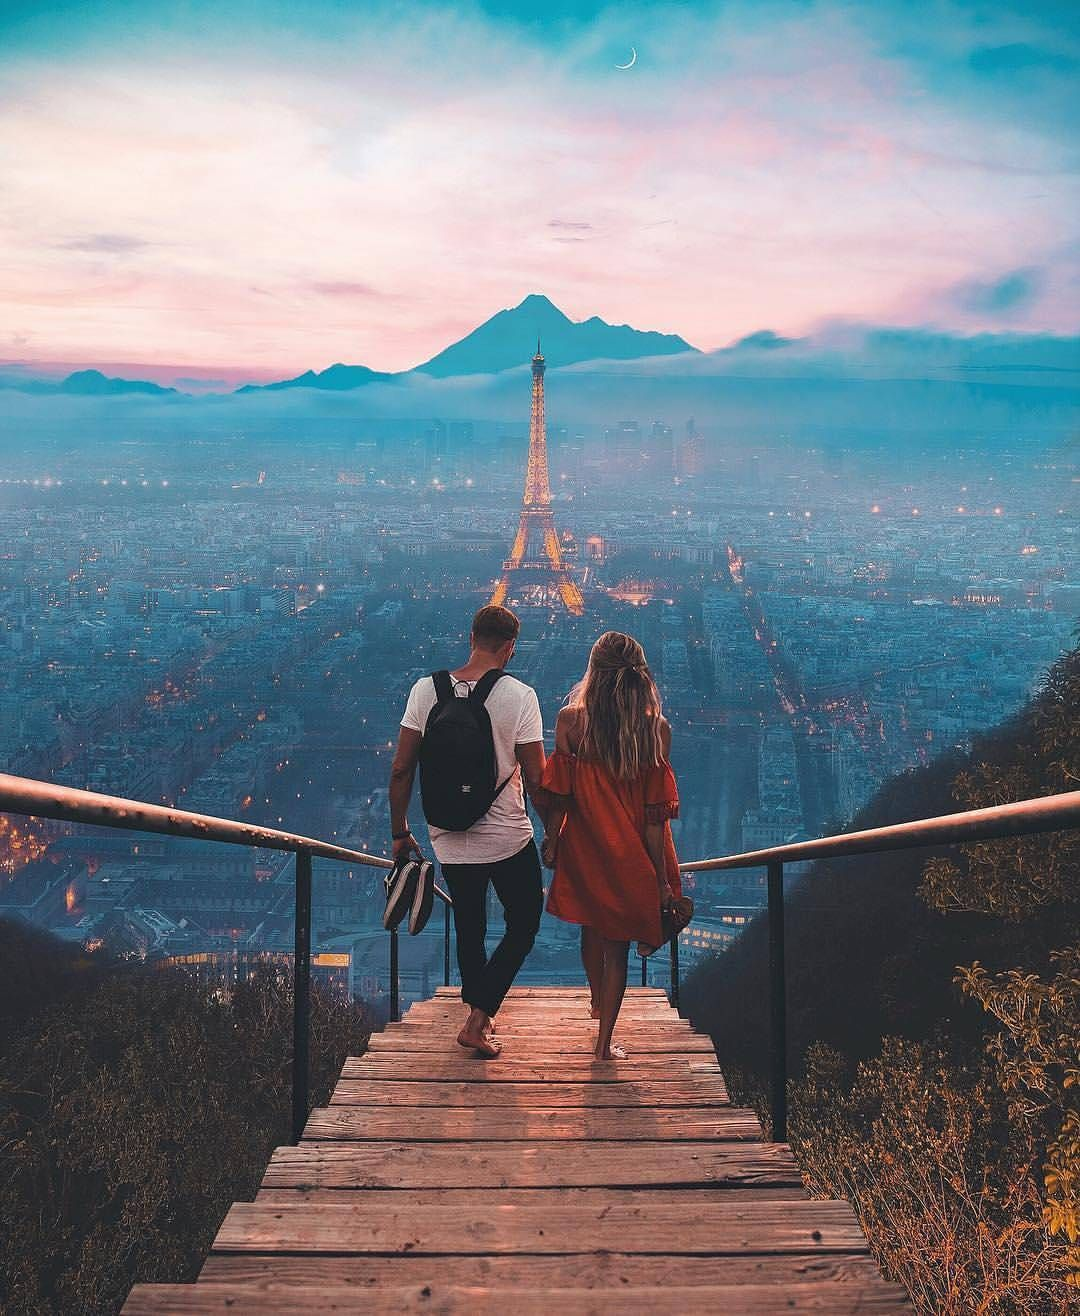 aphrodite and paris relationship goals